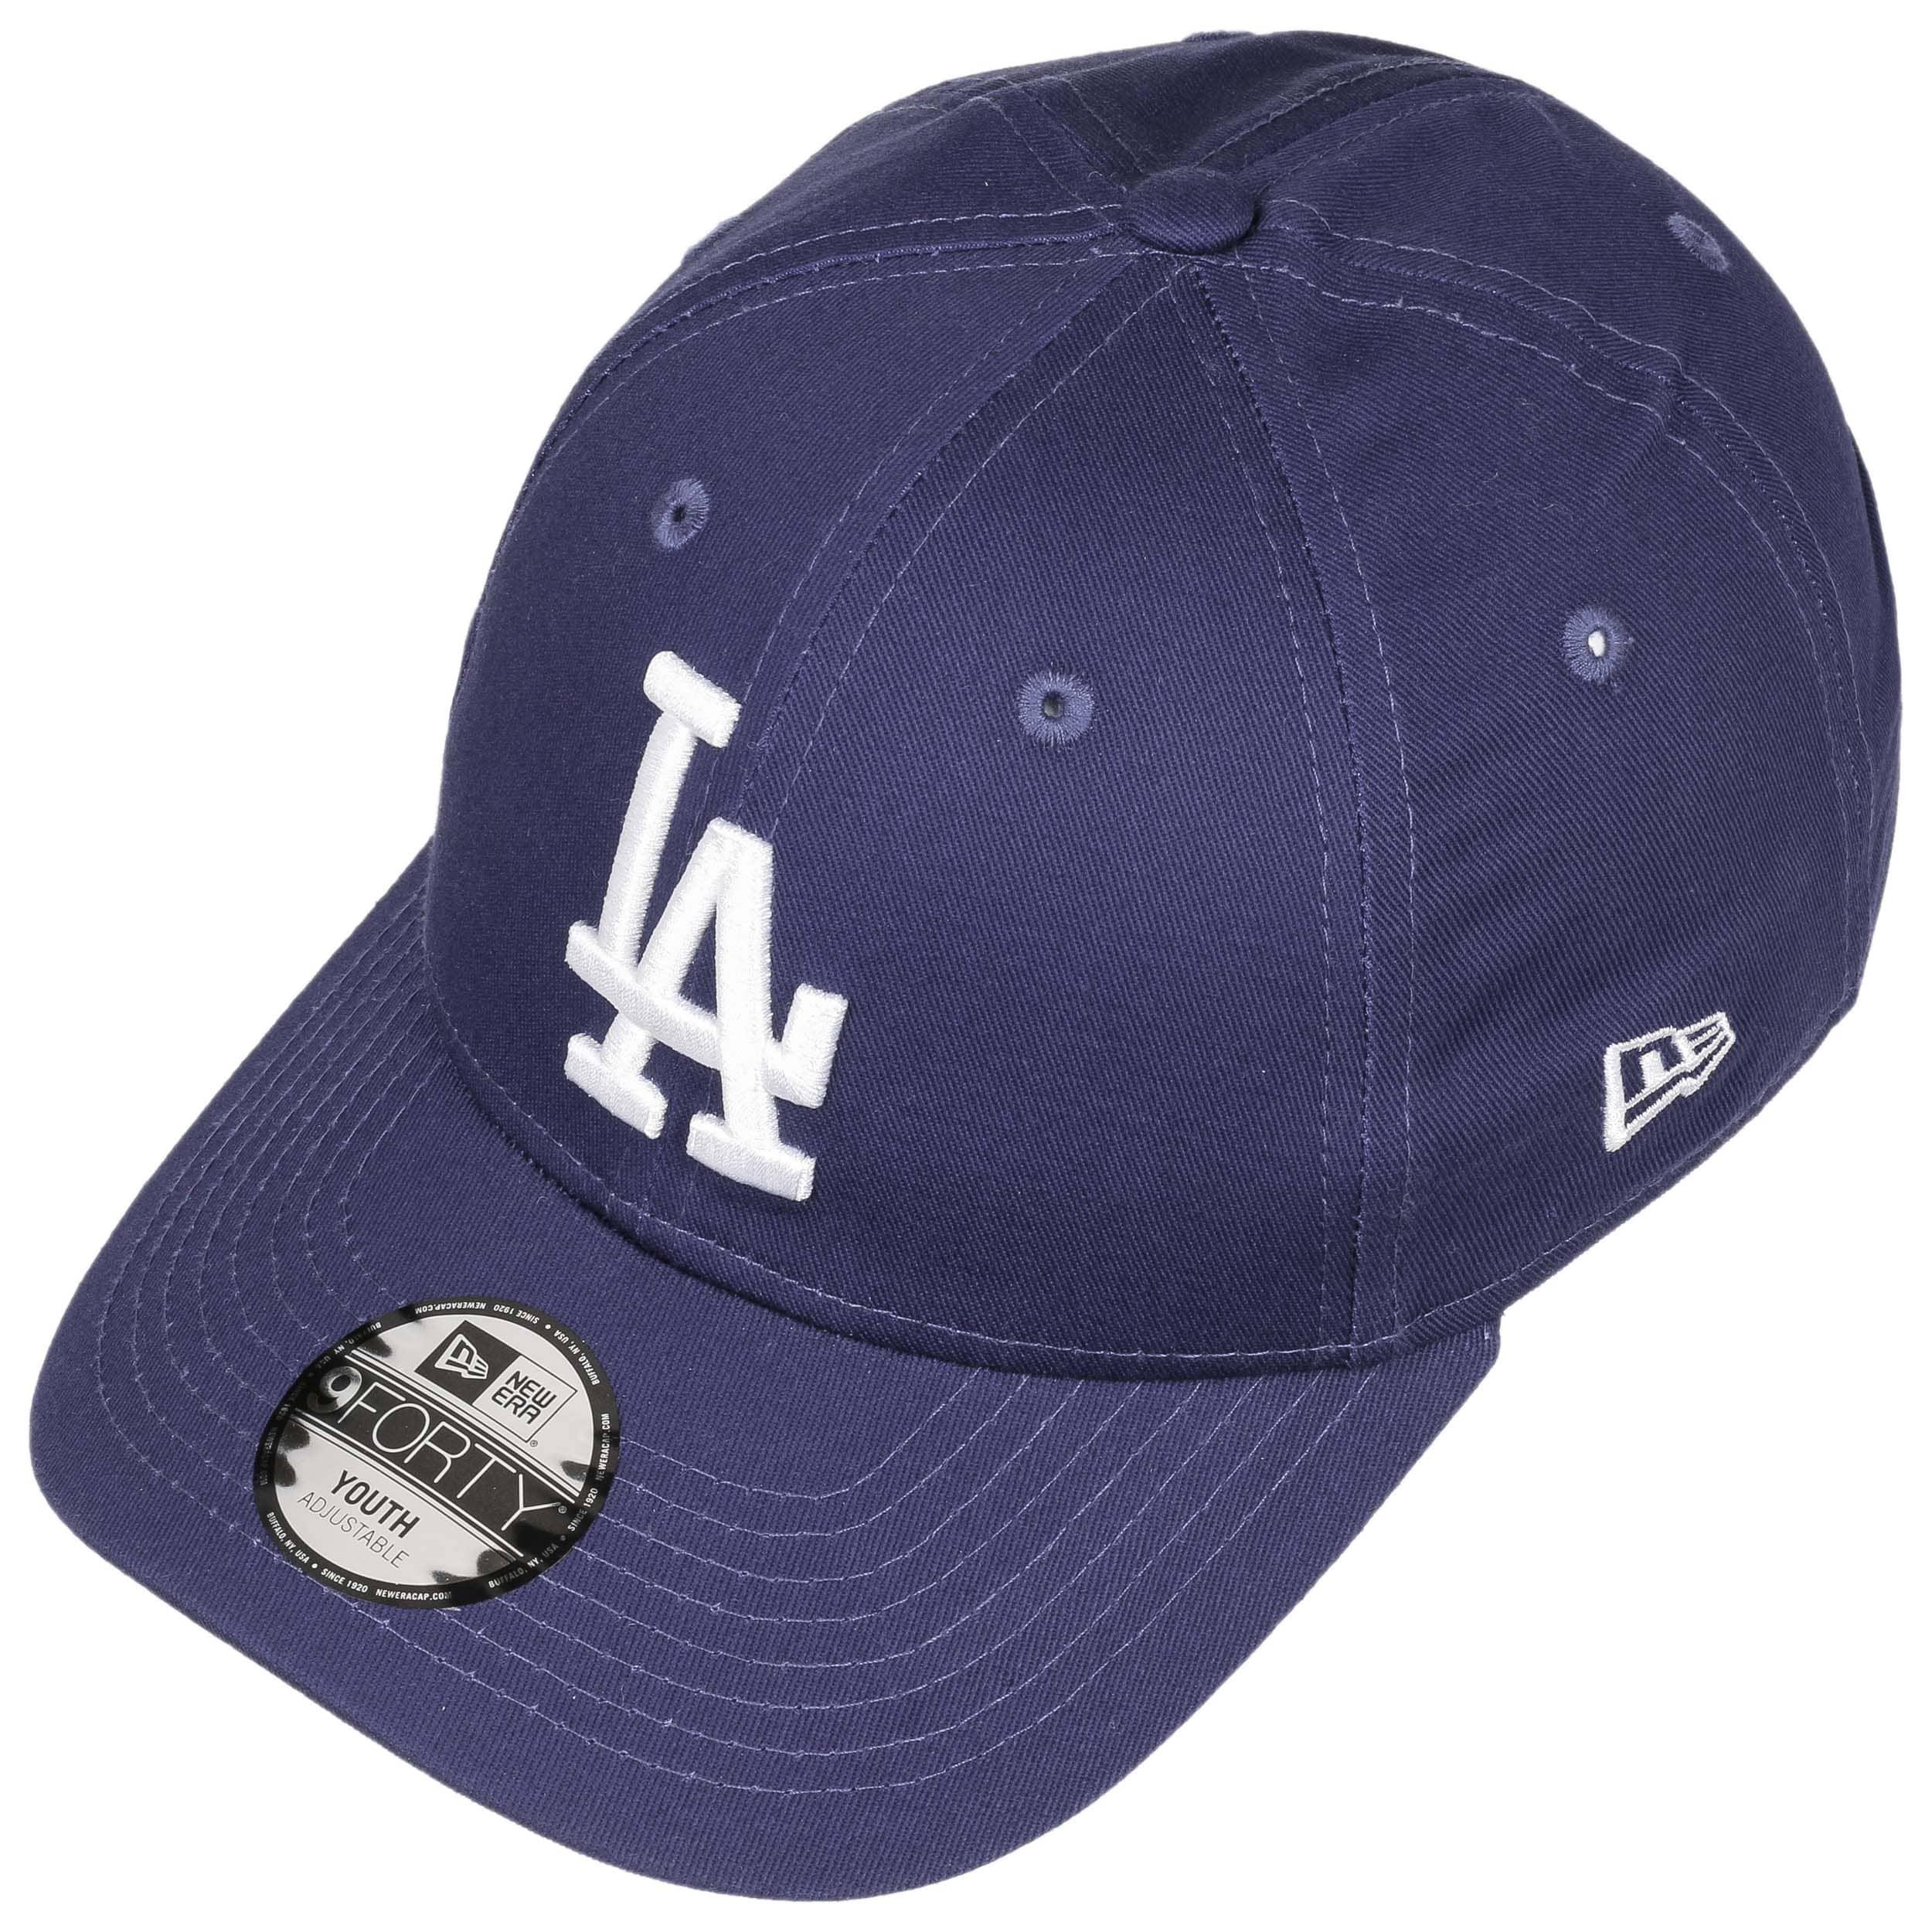 9Forty Junior LA Dodgers Cap by New Era - blue 1 ... 8c22df5ae6e4